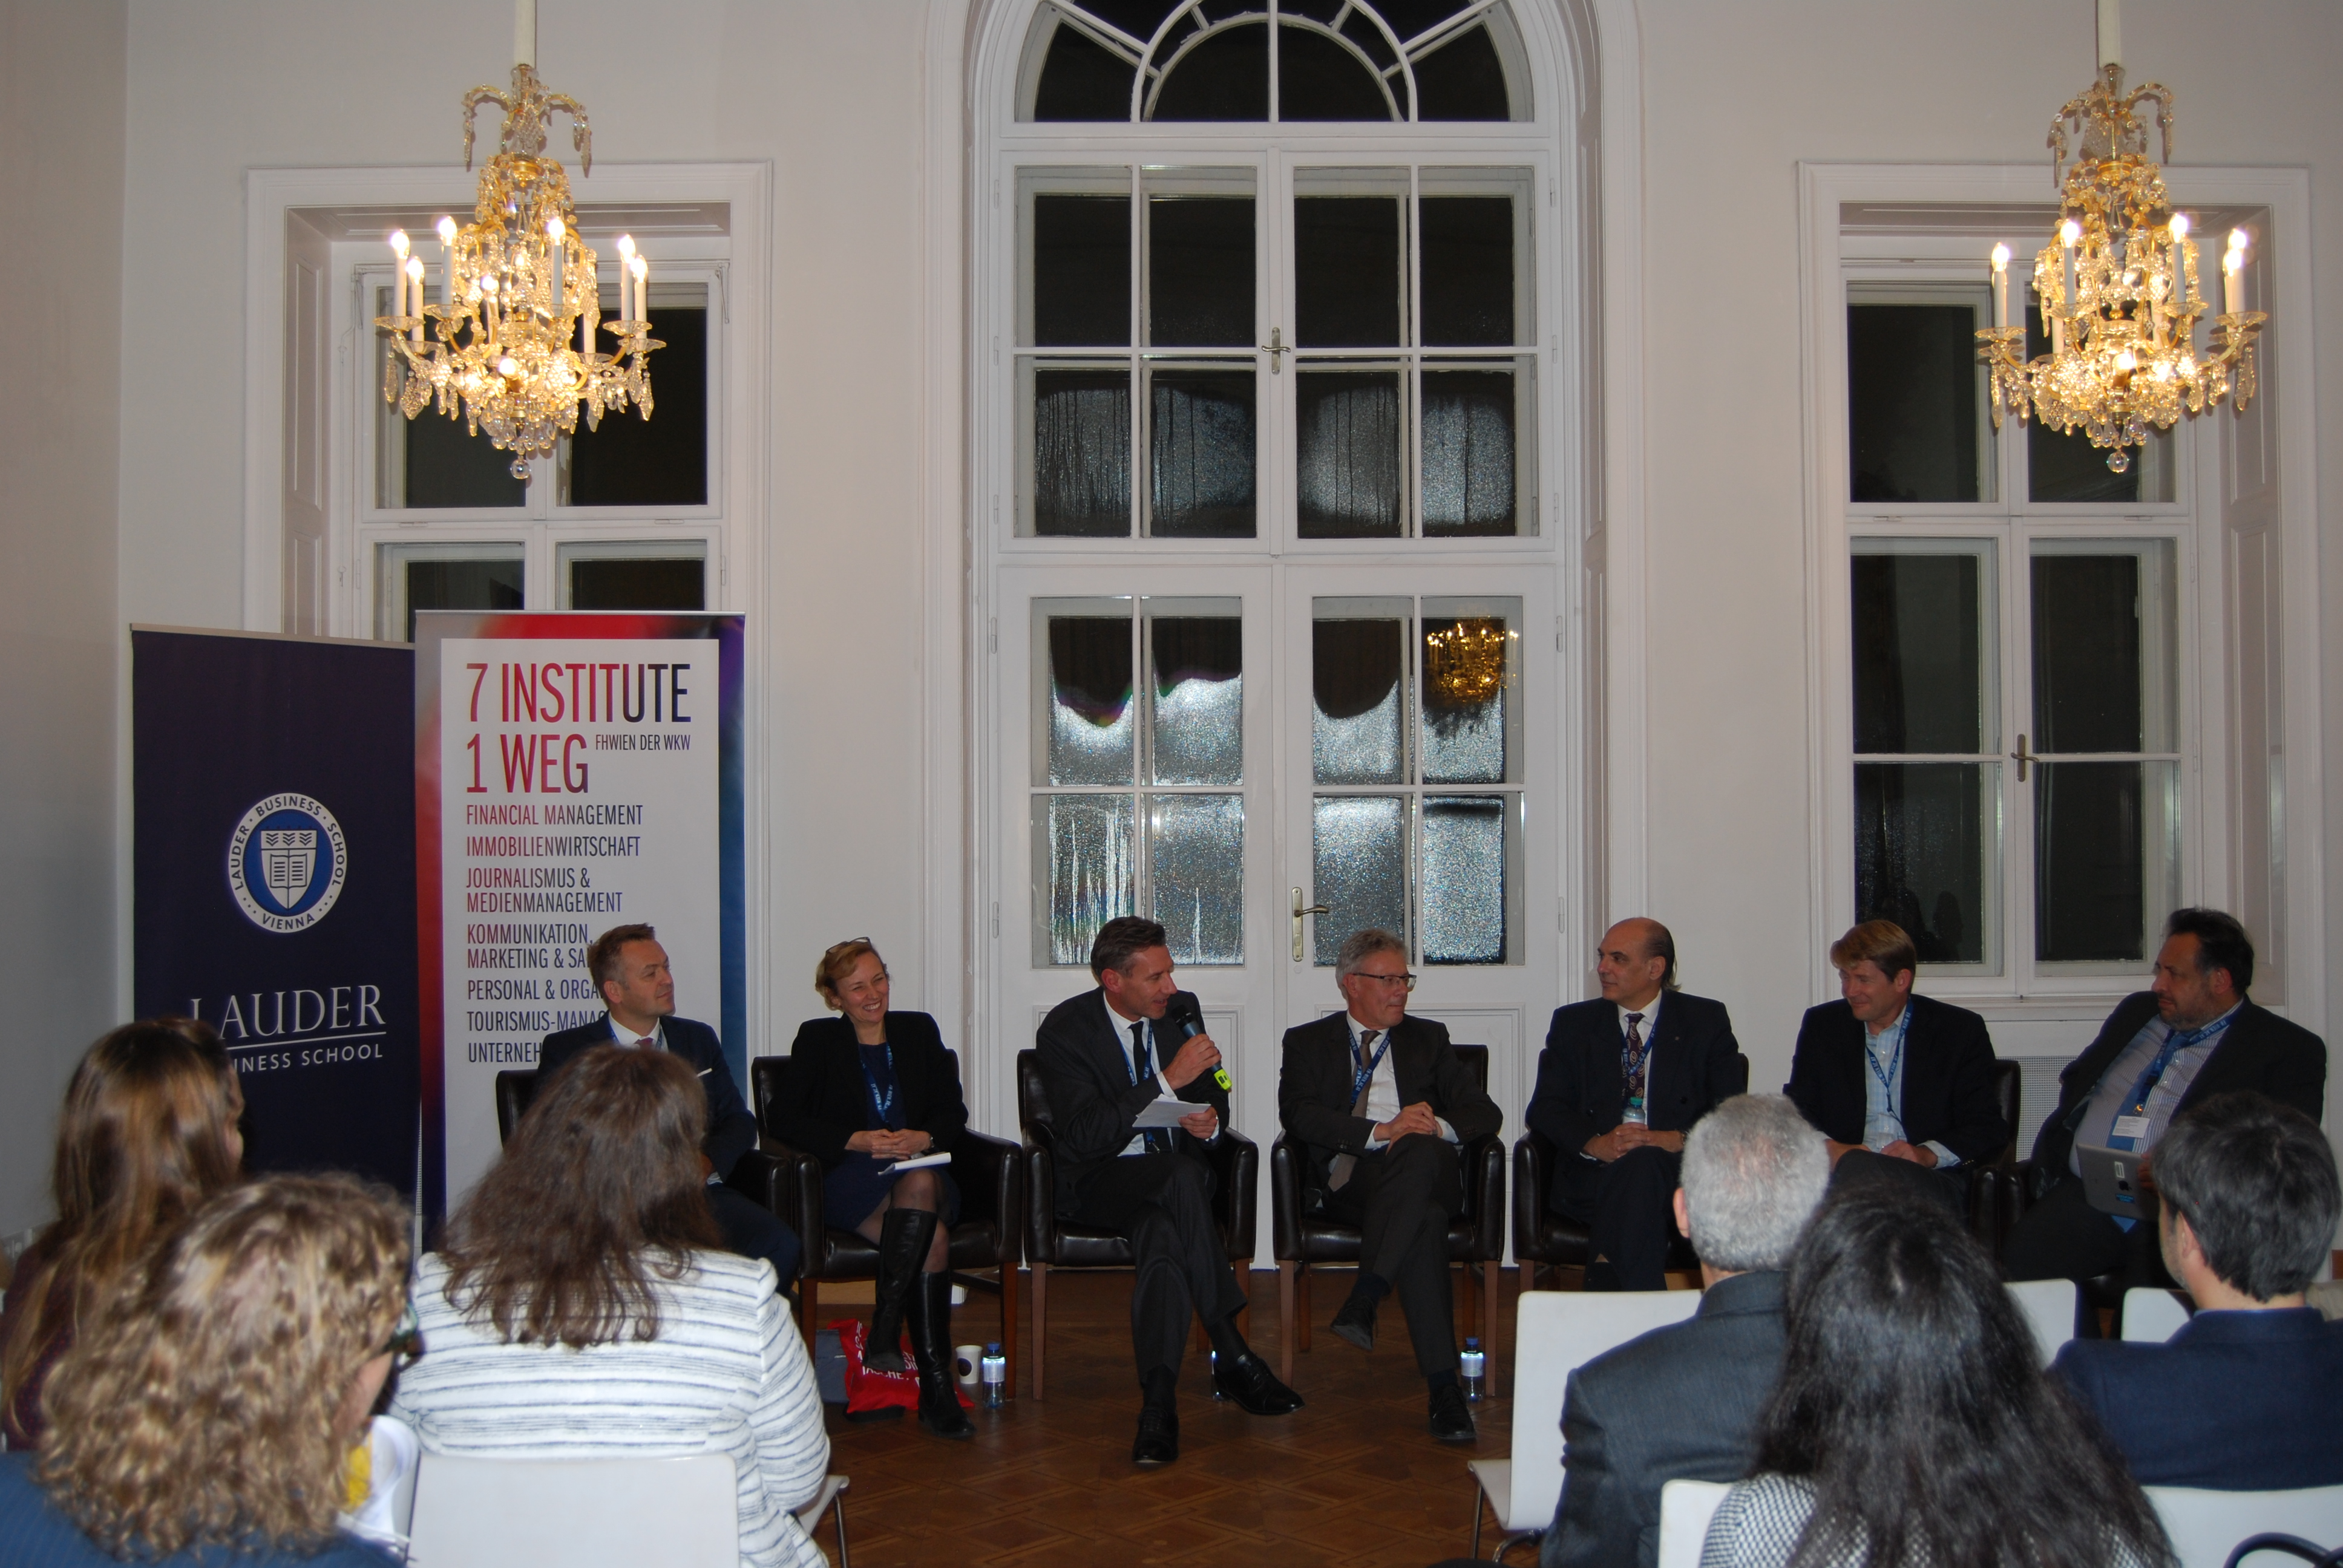 Werner Pamminger (Business Upper Austria), Laura Spence (Royal Holloway), Markus Scholz (FH Wien), Albin Hahn (Manner), Pablo Collazzo-Yelpo, Marc Pfitzer (FSG), Bernardo Calzadilla-Sarmiento (UNIDO)